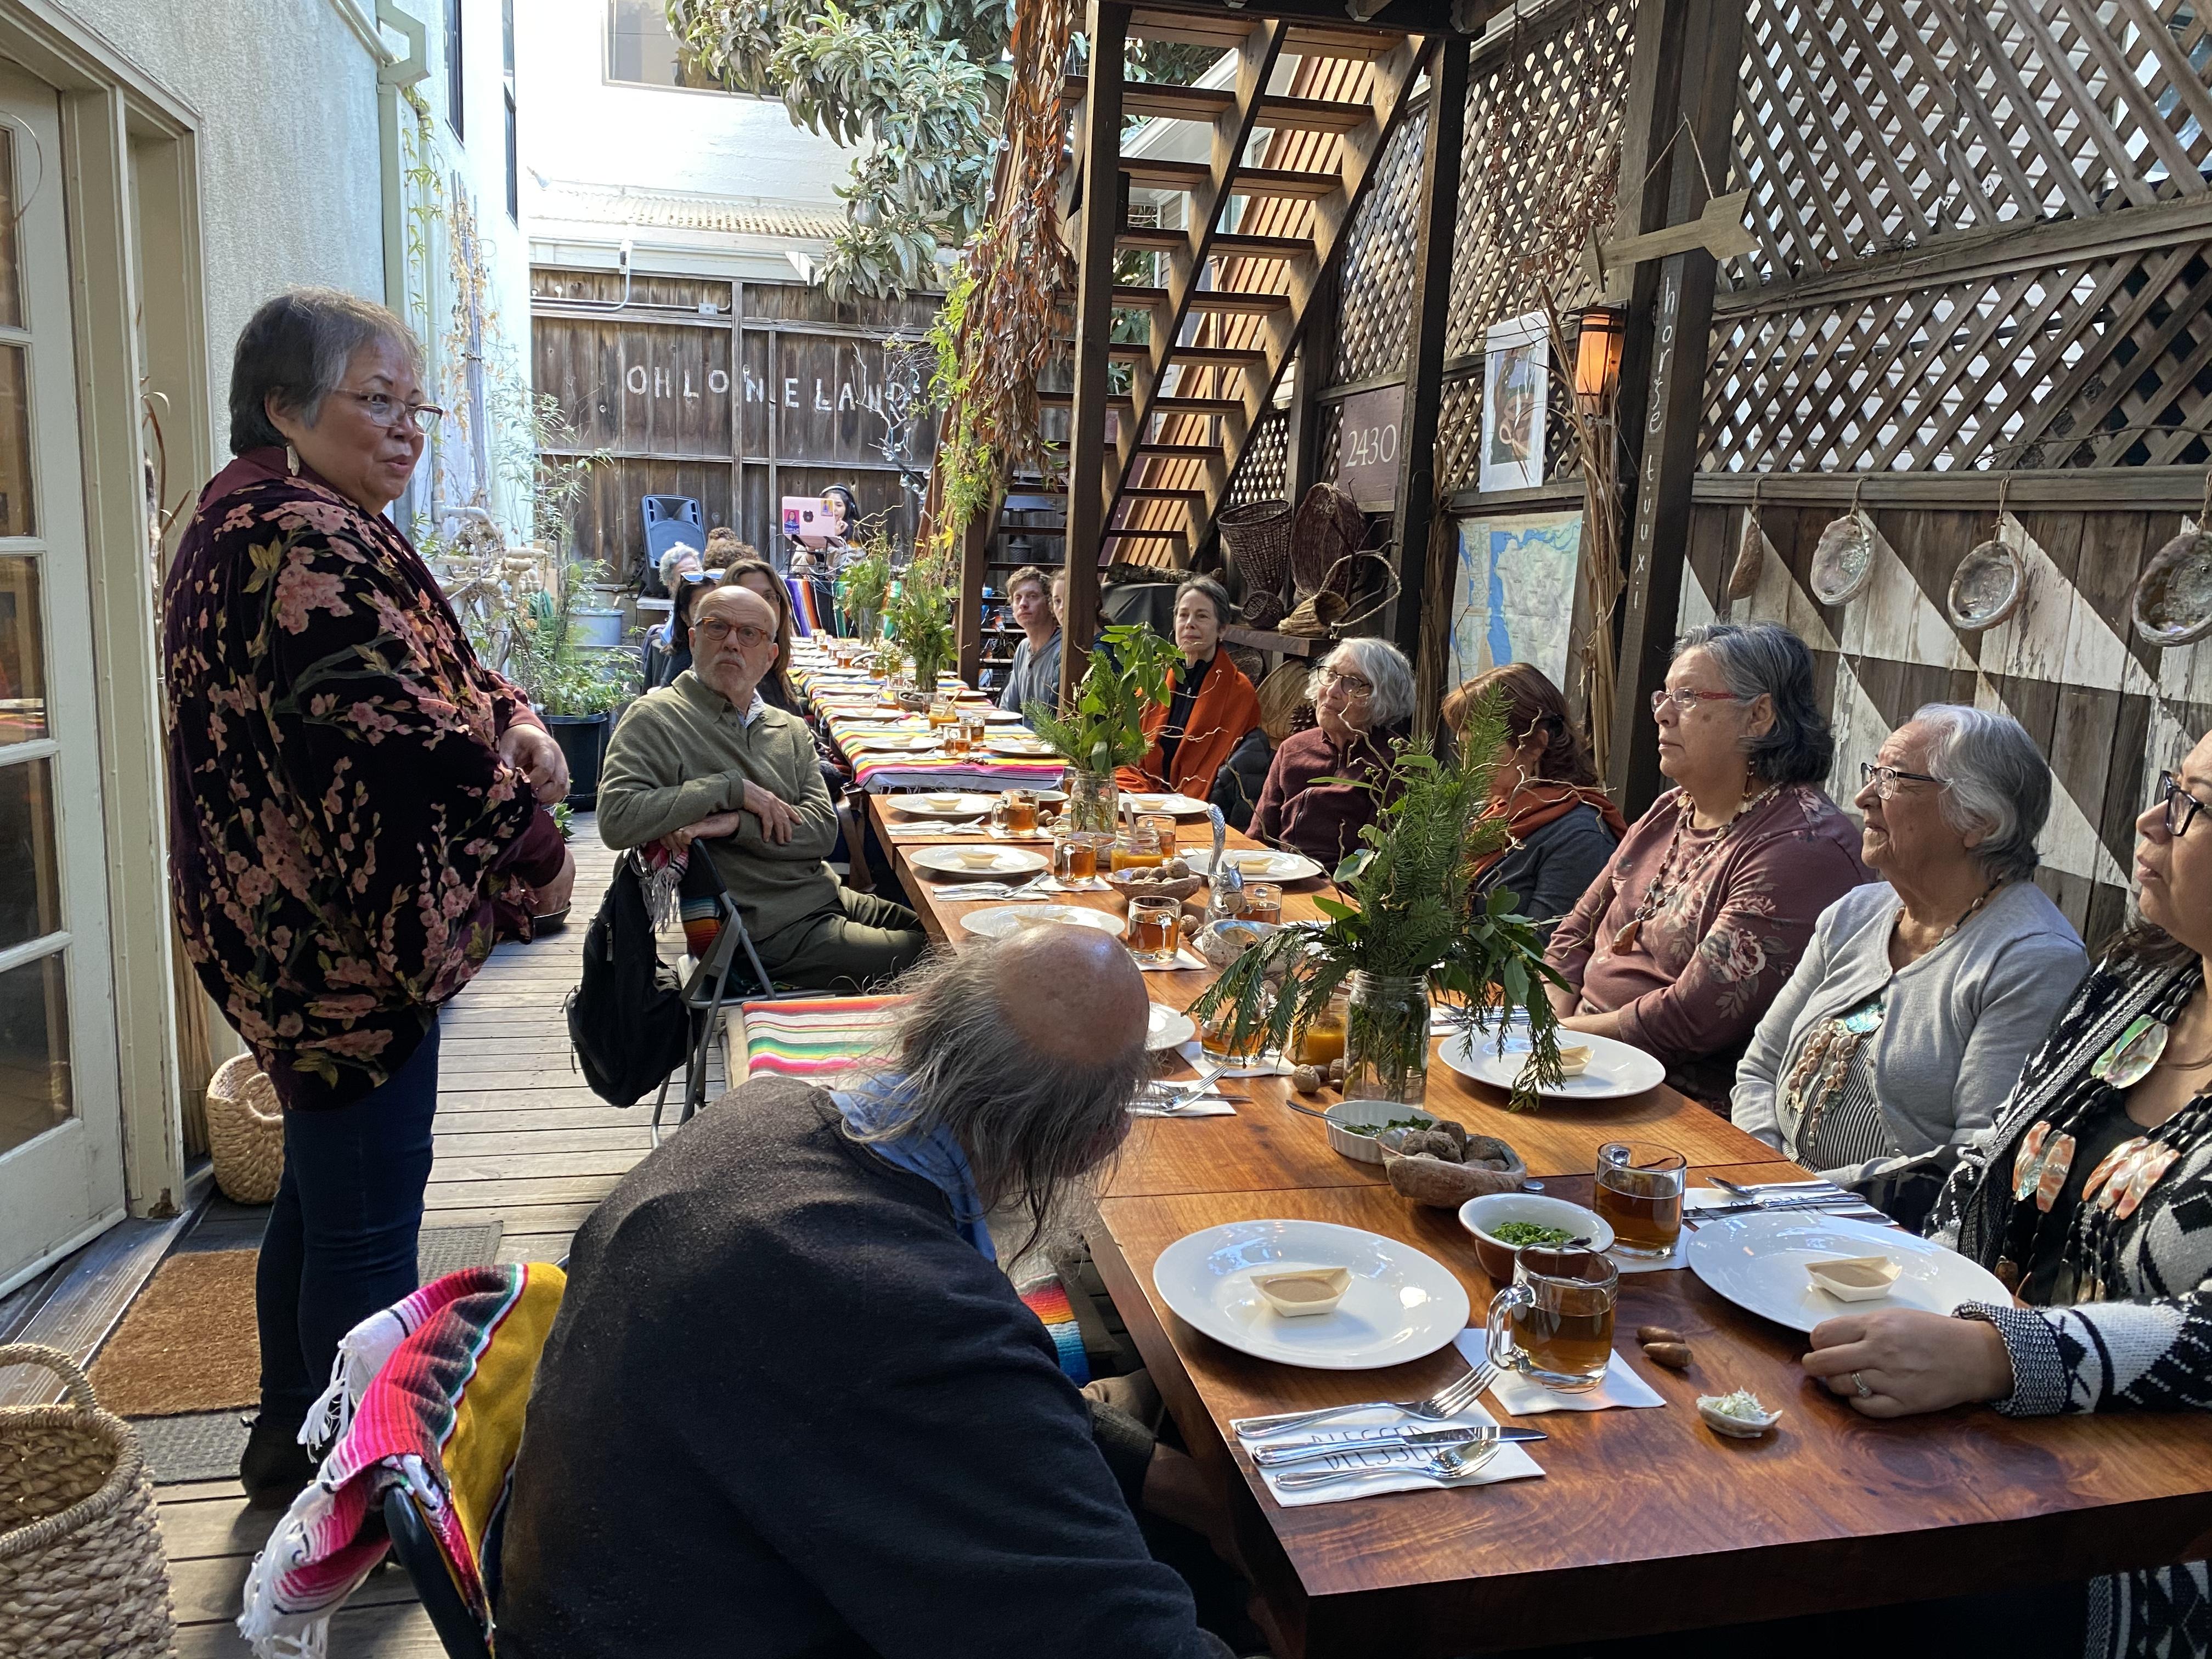 A dinner at Cafe Ohlone prior to the coronavirus shutdown